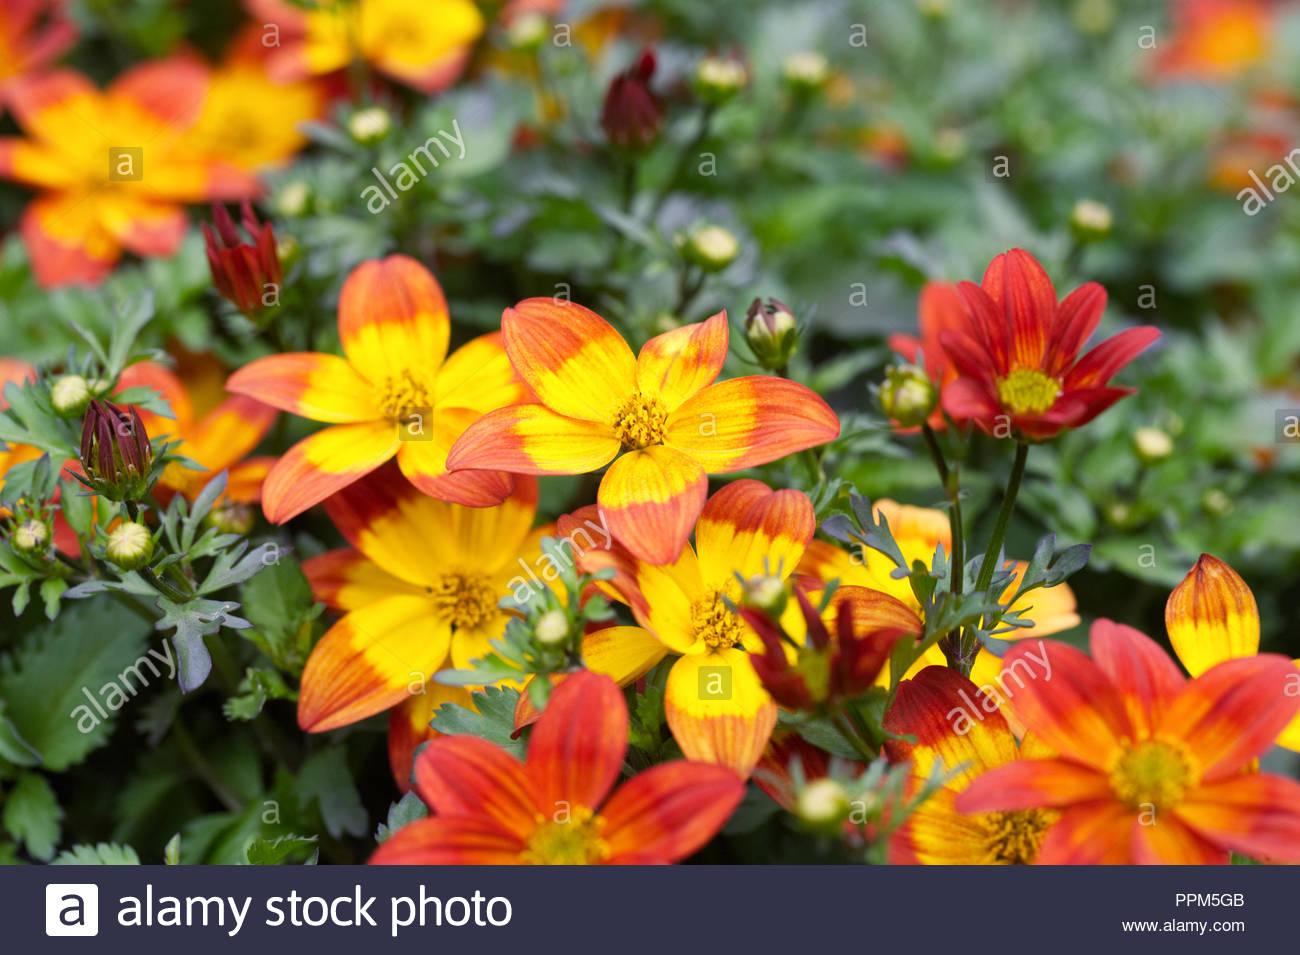 Bidens 'Blazing Fire' flowers. - Stock Image